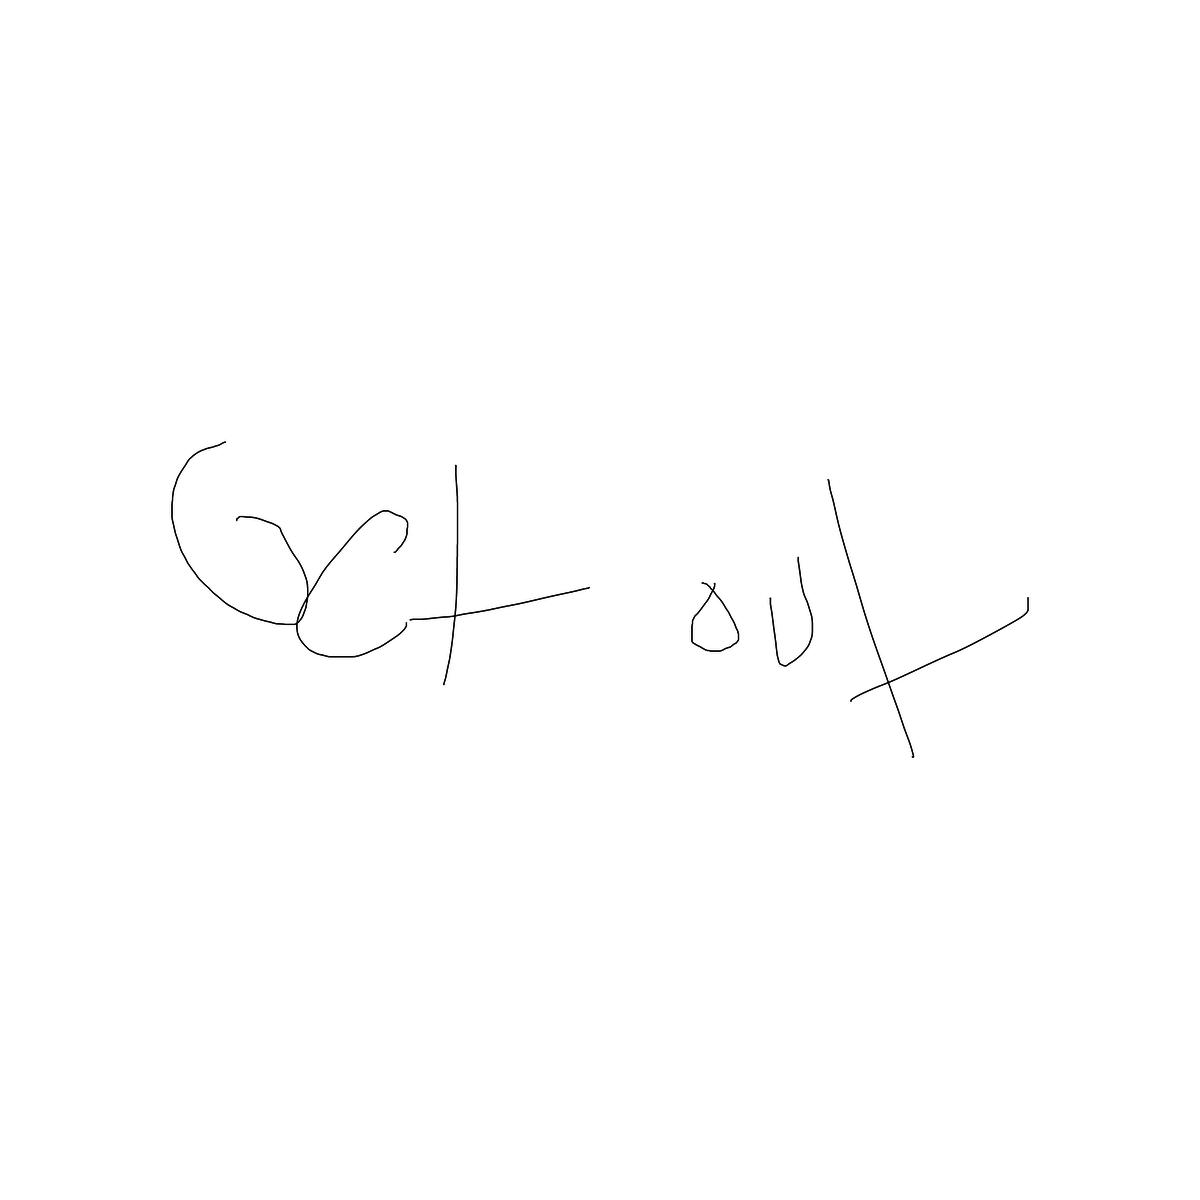 BAAAM drawing#250 lat:38.7724151611328100lng: -90.6553421020507800